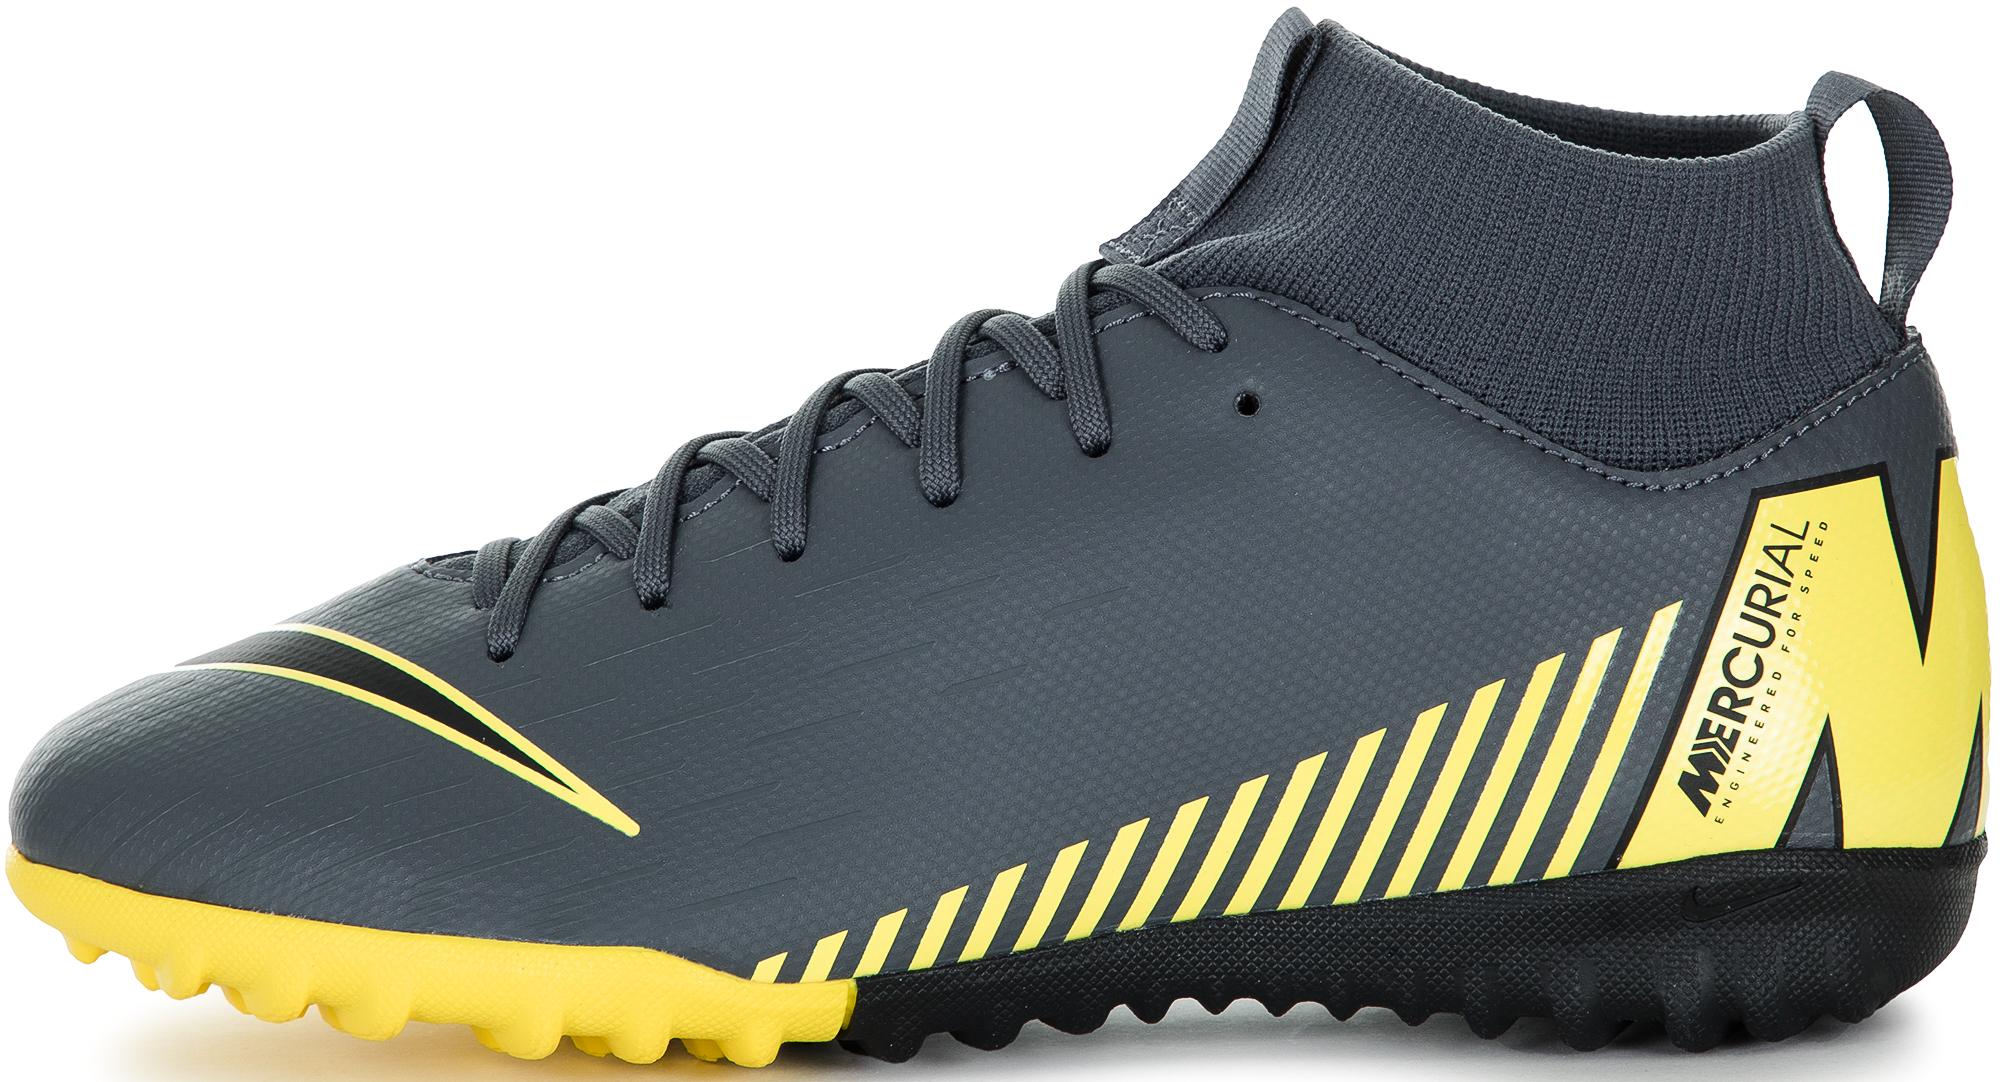 Nike Бутсы для мальчиков Nike Mercurial Superfly 6 Academy GS TF, размер 35,5 цена